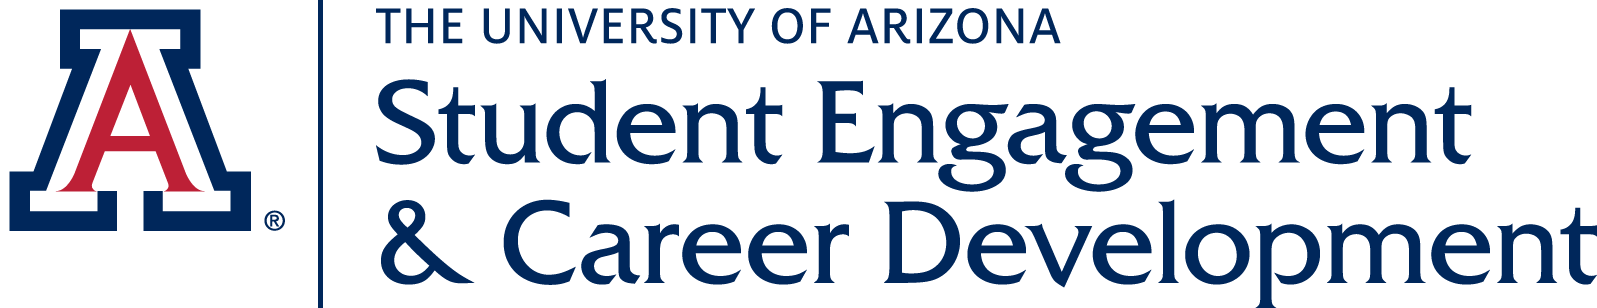 Student Engagement & Career Development